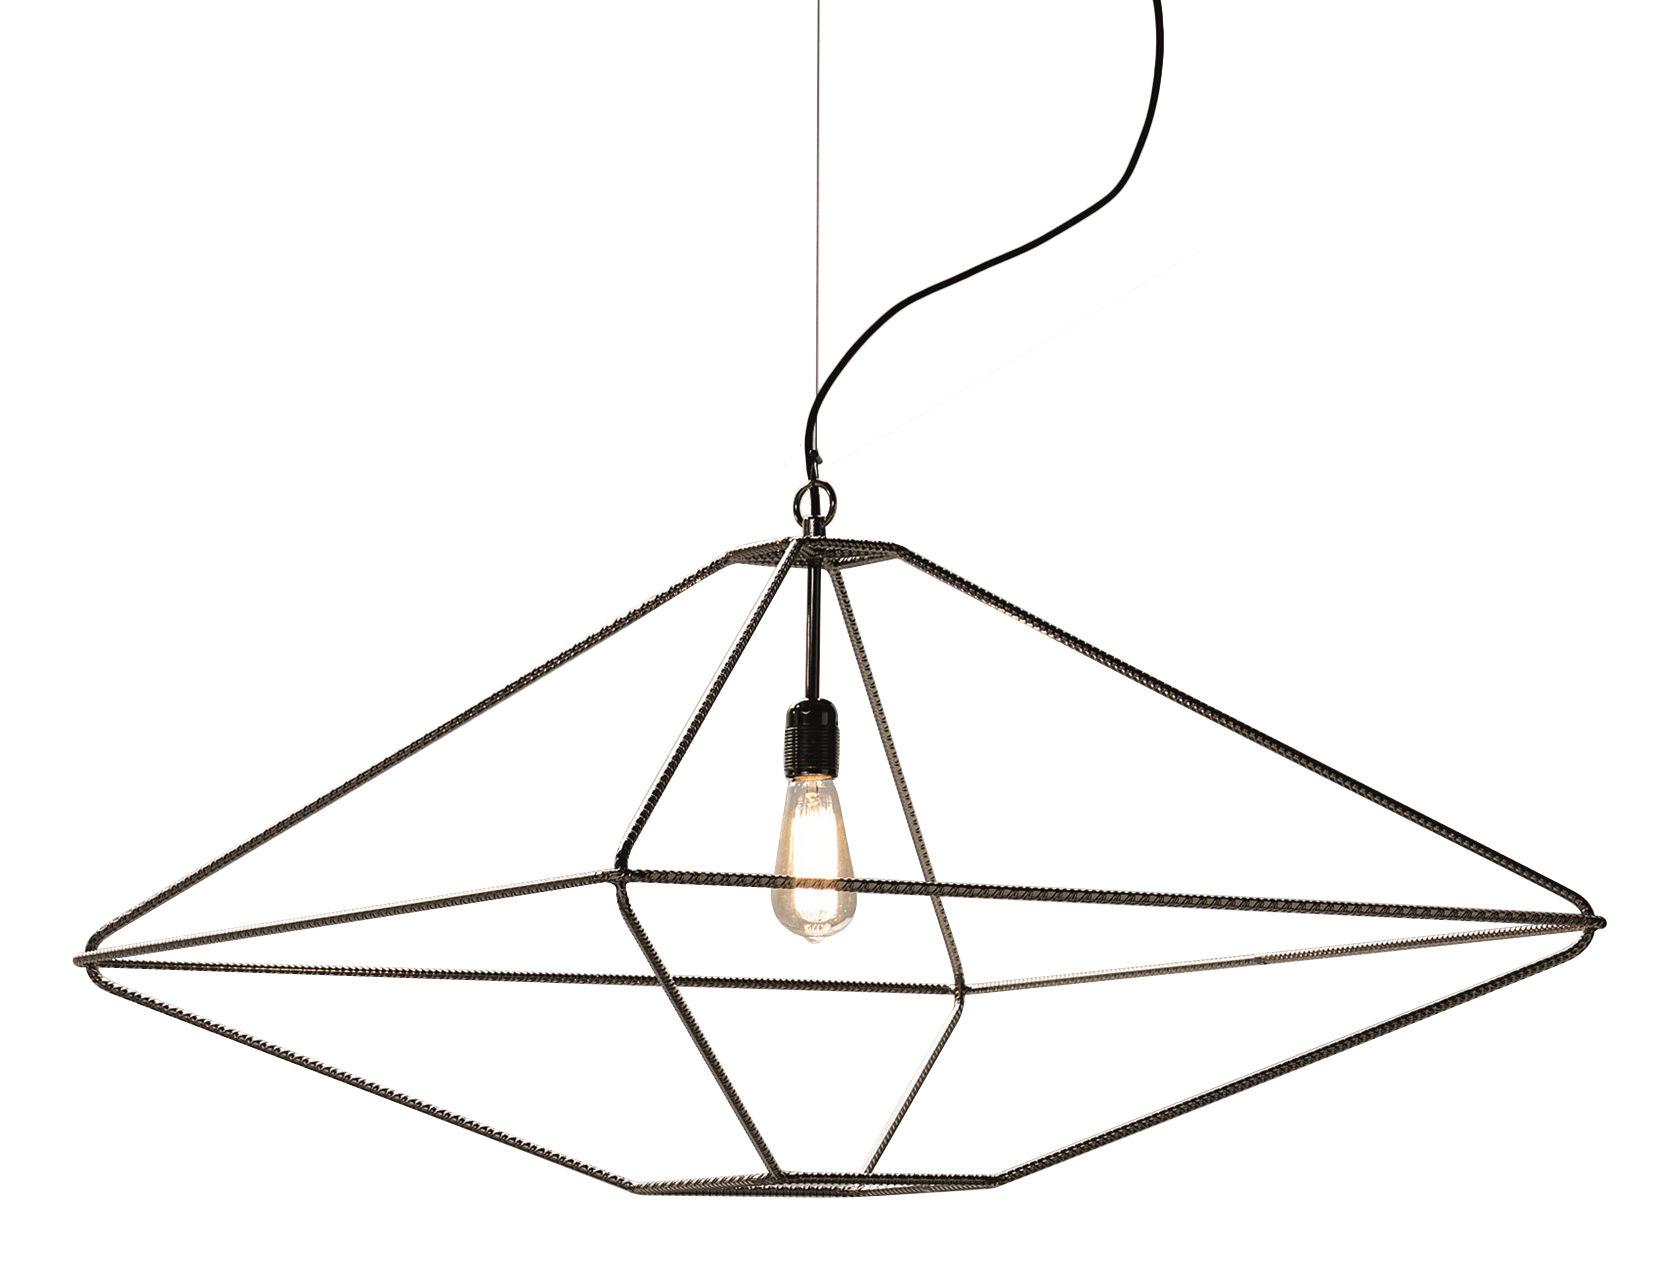 Conadition Large Lamp Chrome By Opinion Ciatti